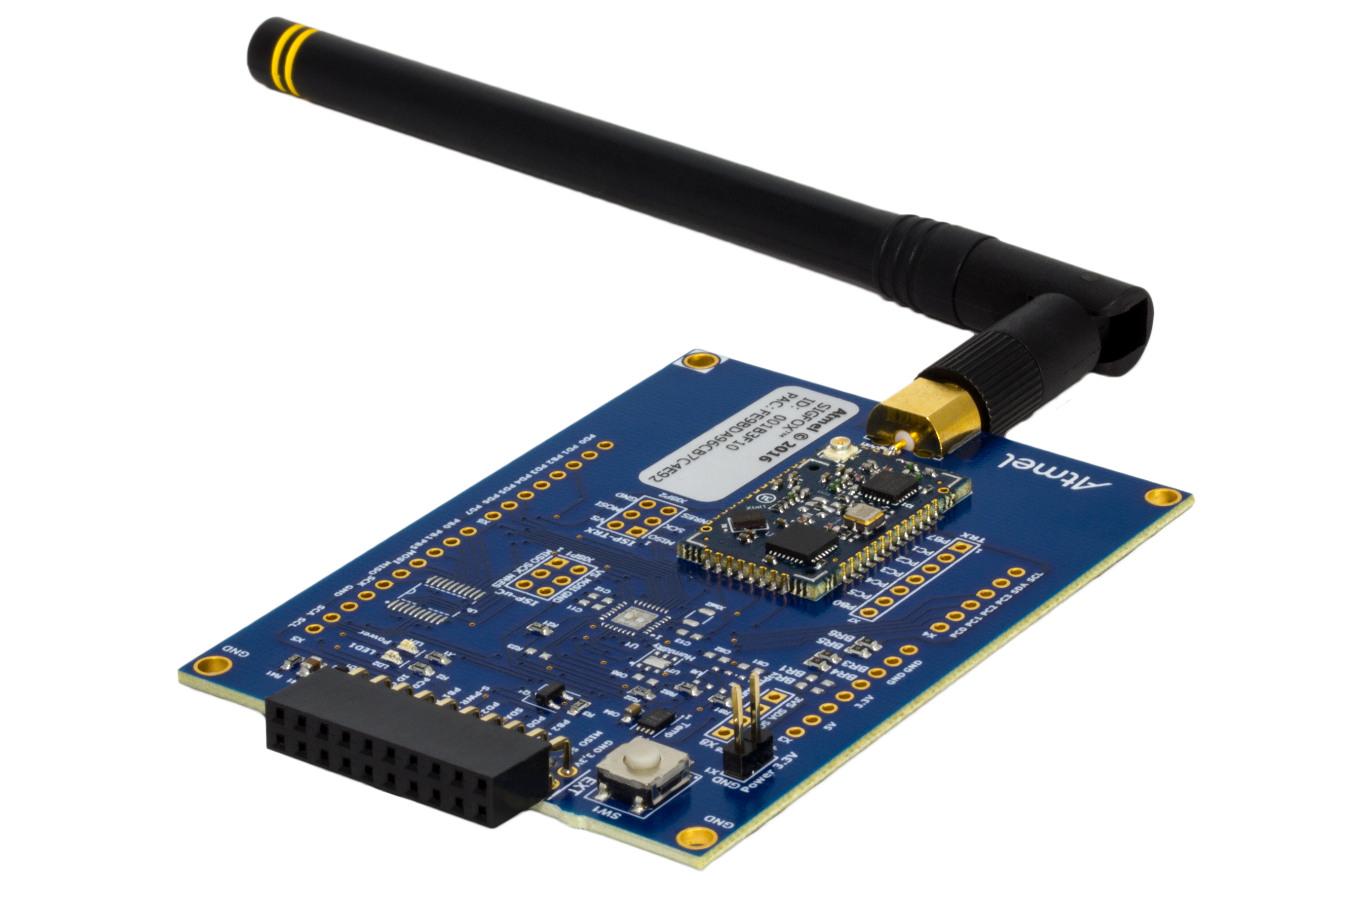 ATA8520-EK3-F | Sigfox Partner Network | The IoT solution book